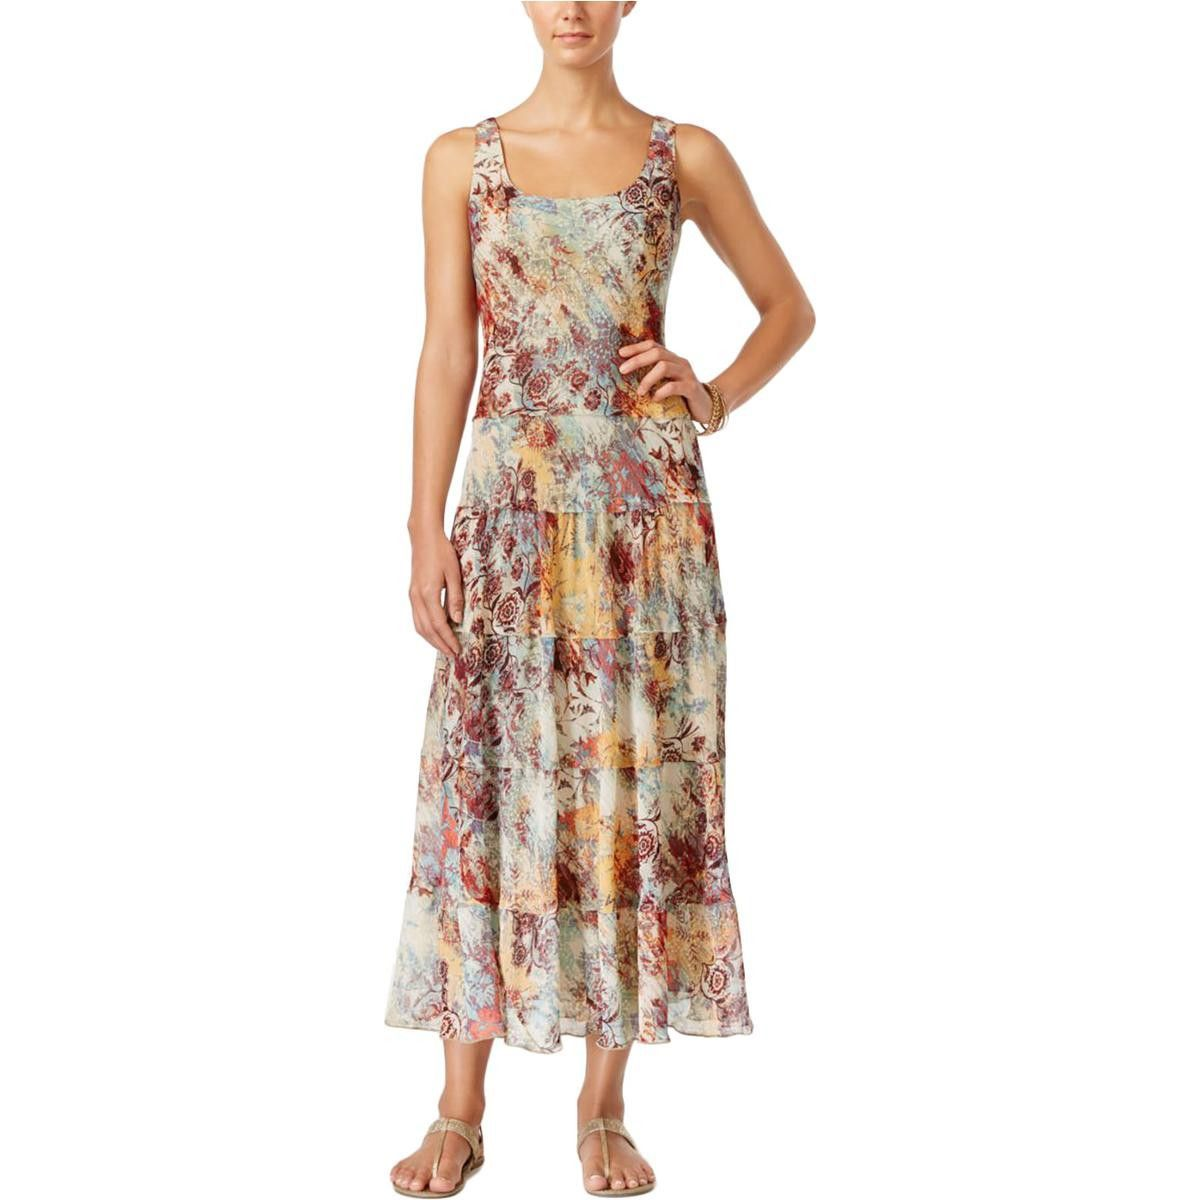 b5866f4022e Nine West Womens Sleeveless Printed Maxi Dress